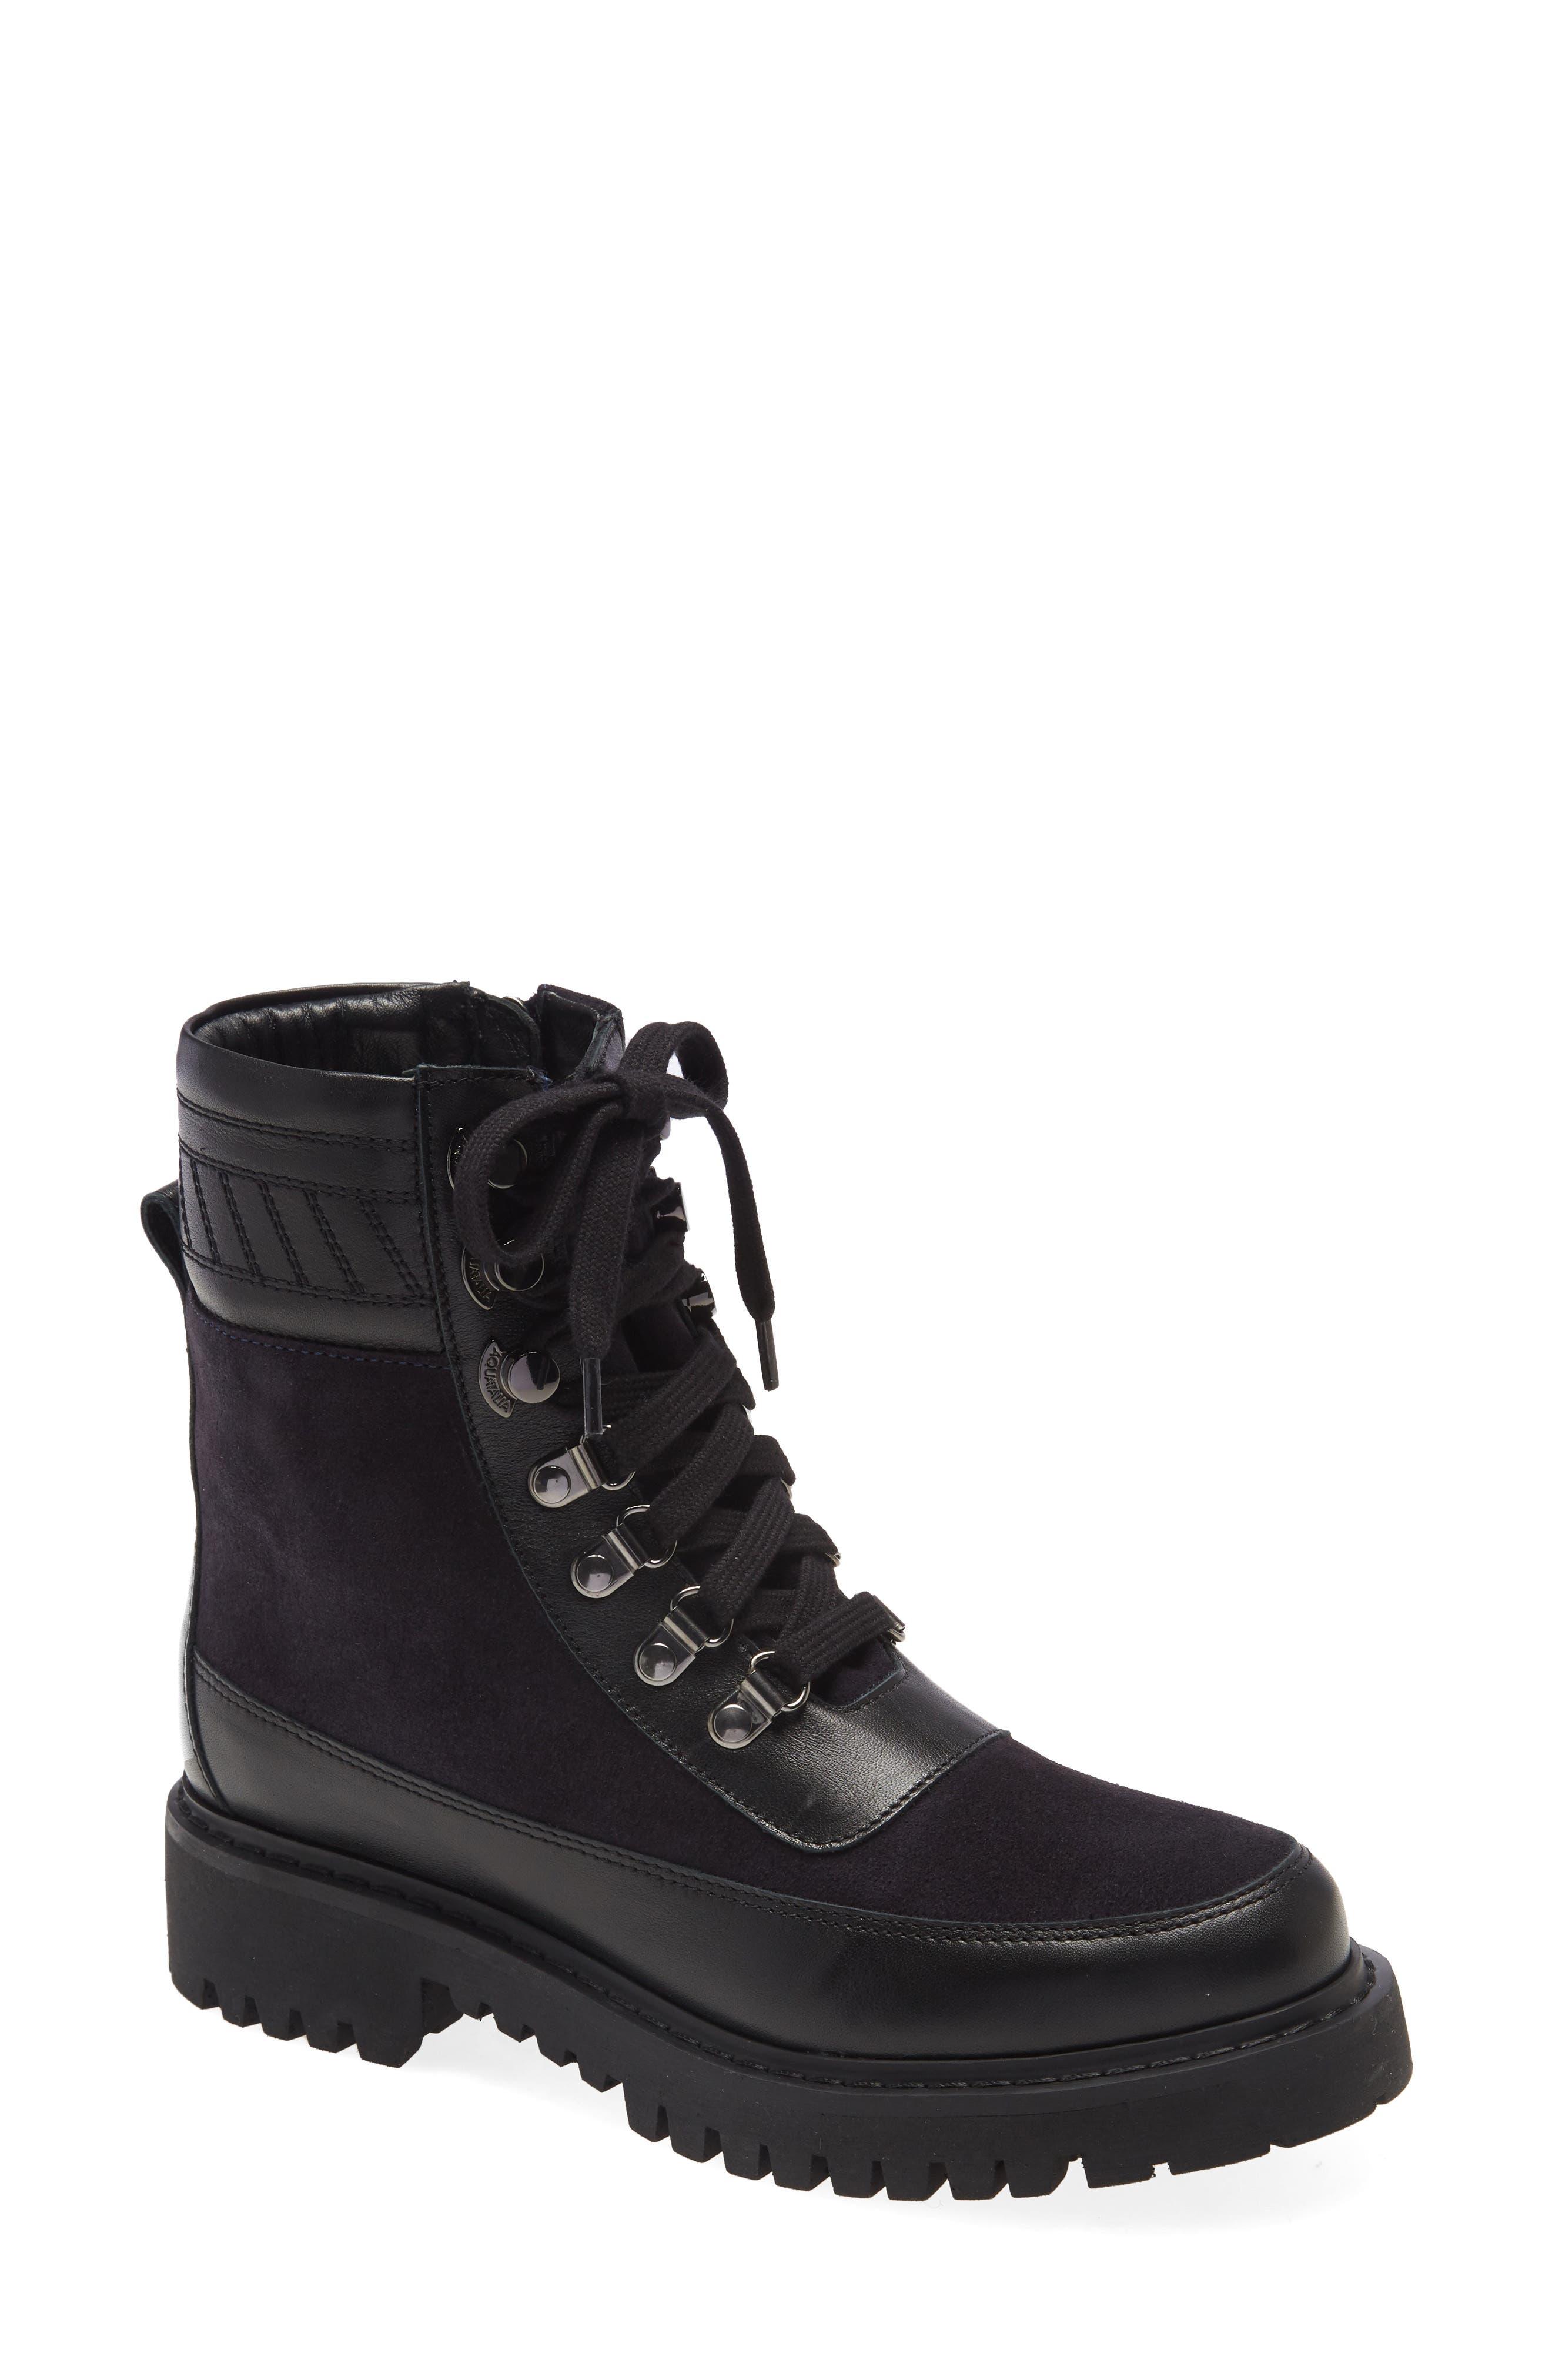 Johanna Waterproof Hiker Boot